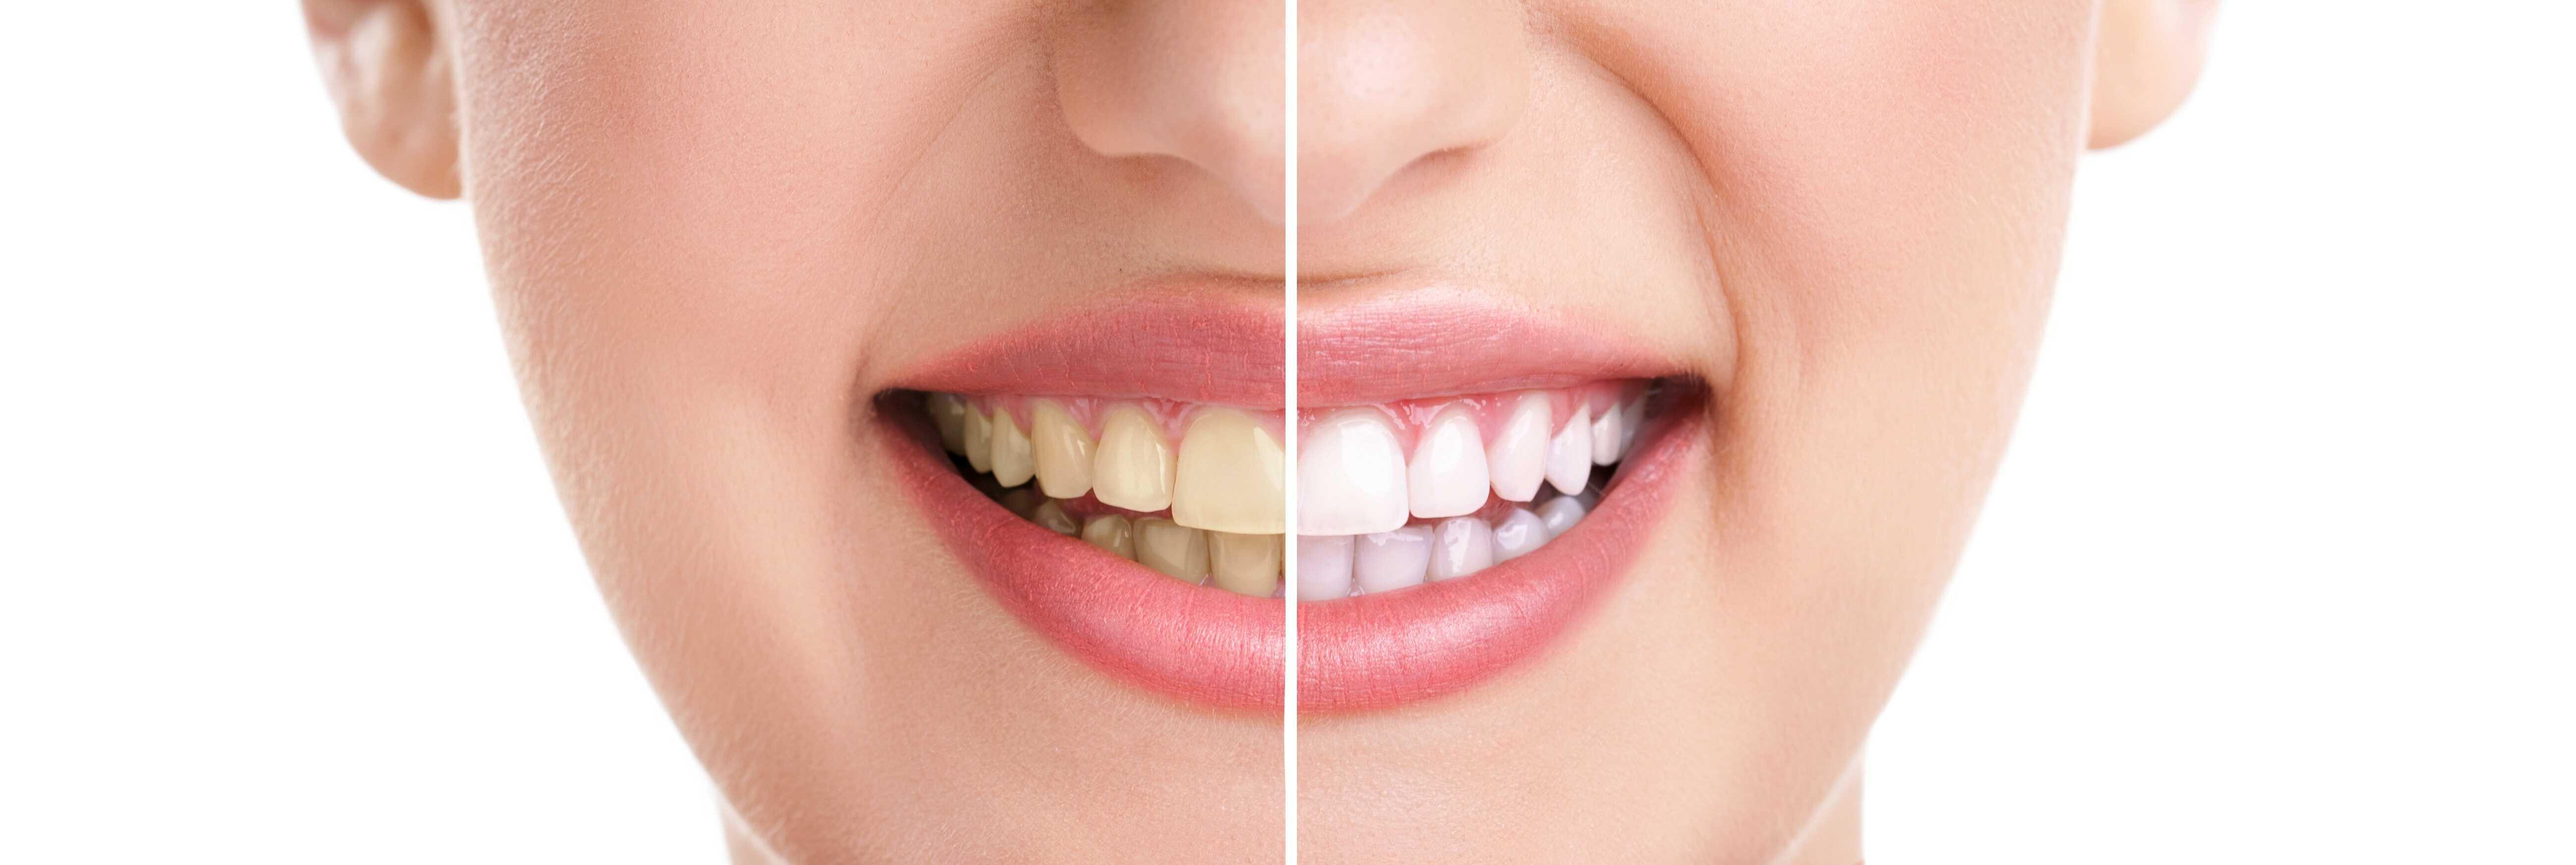 woman teeth smile